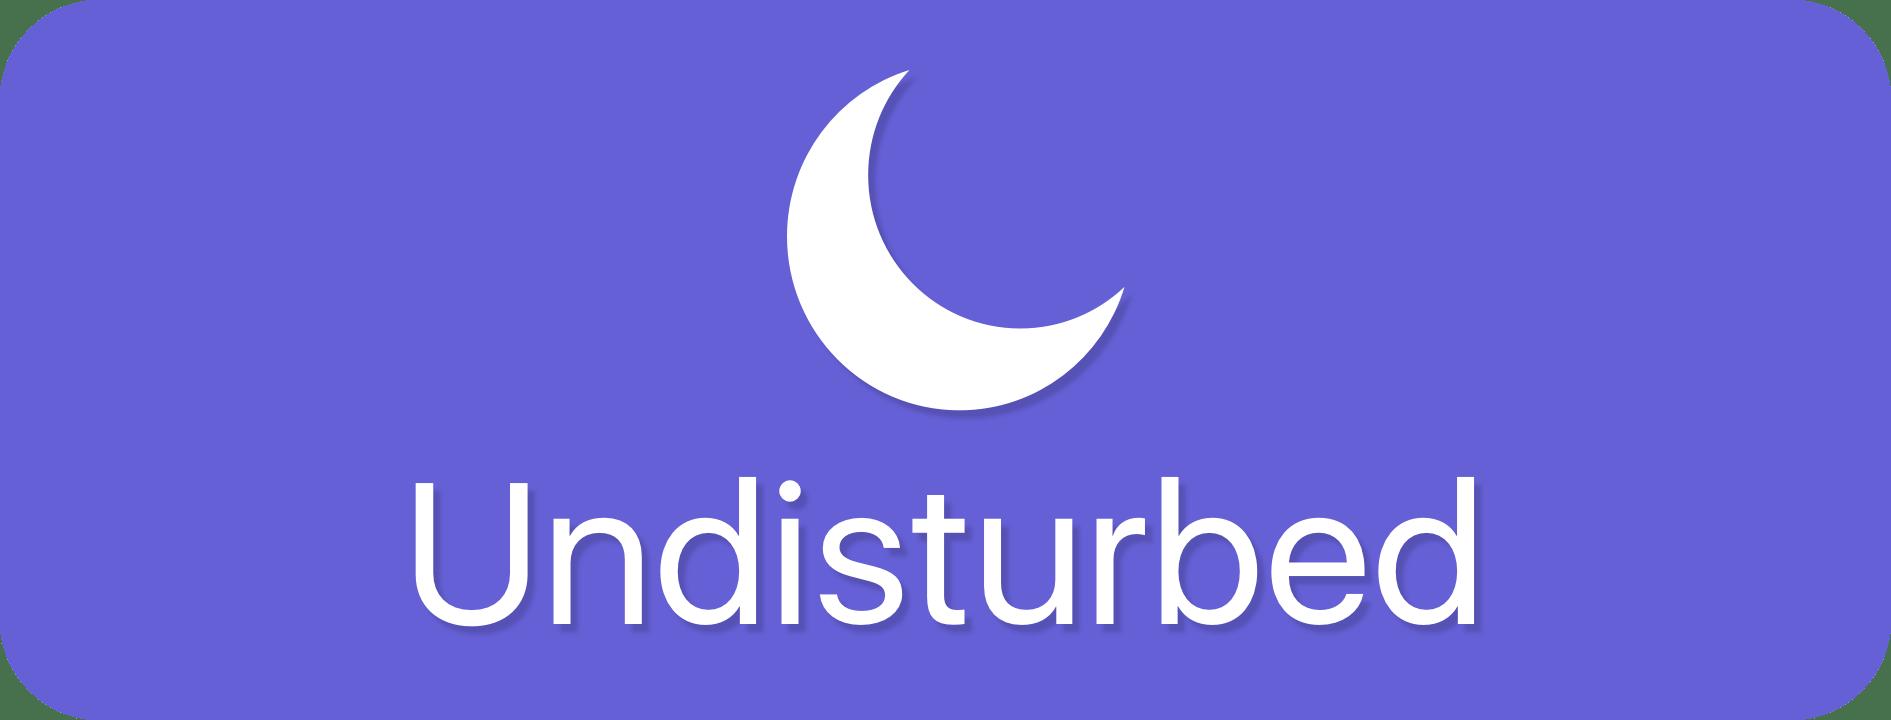 Undisturbed